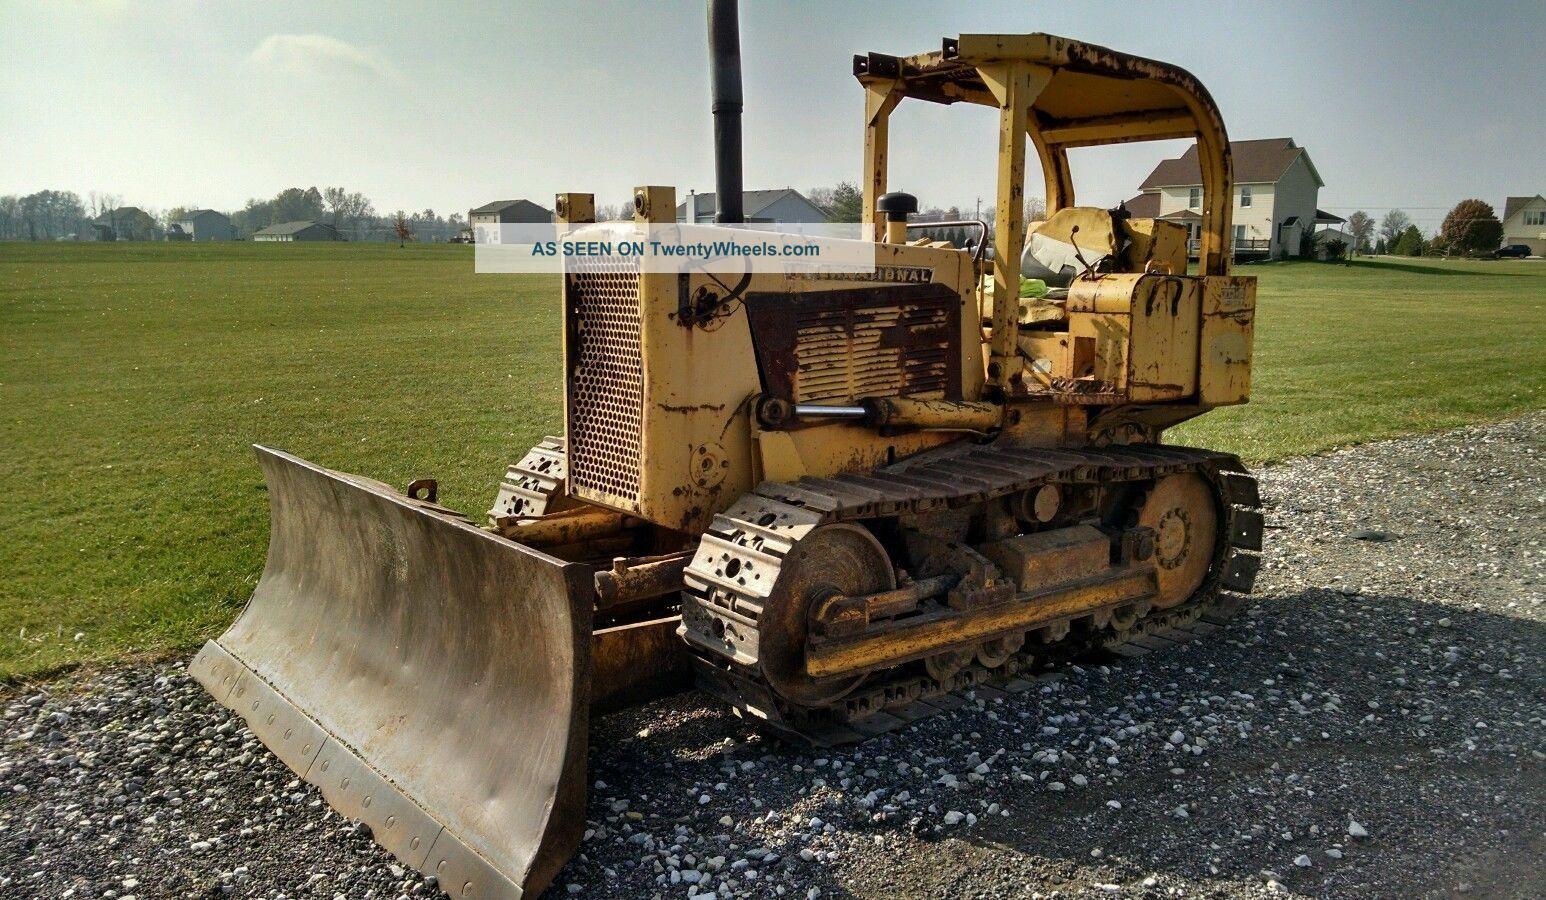 International Td8 Td - 8 Bulldozer Dozer Crawler Crawler Dozers & Loaders photo